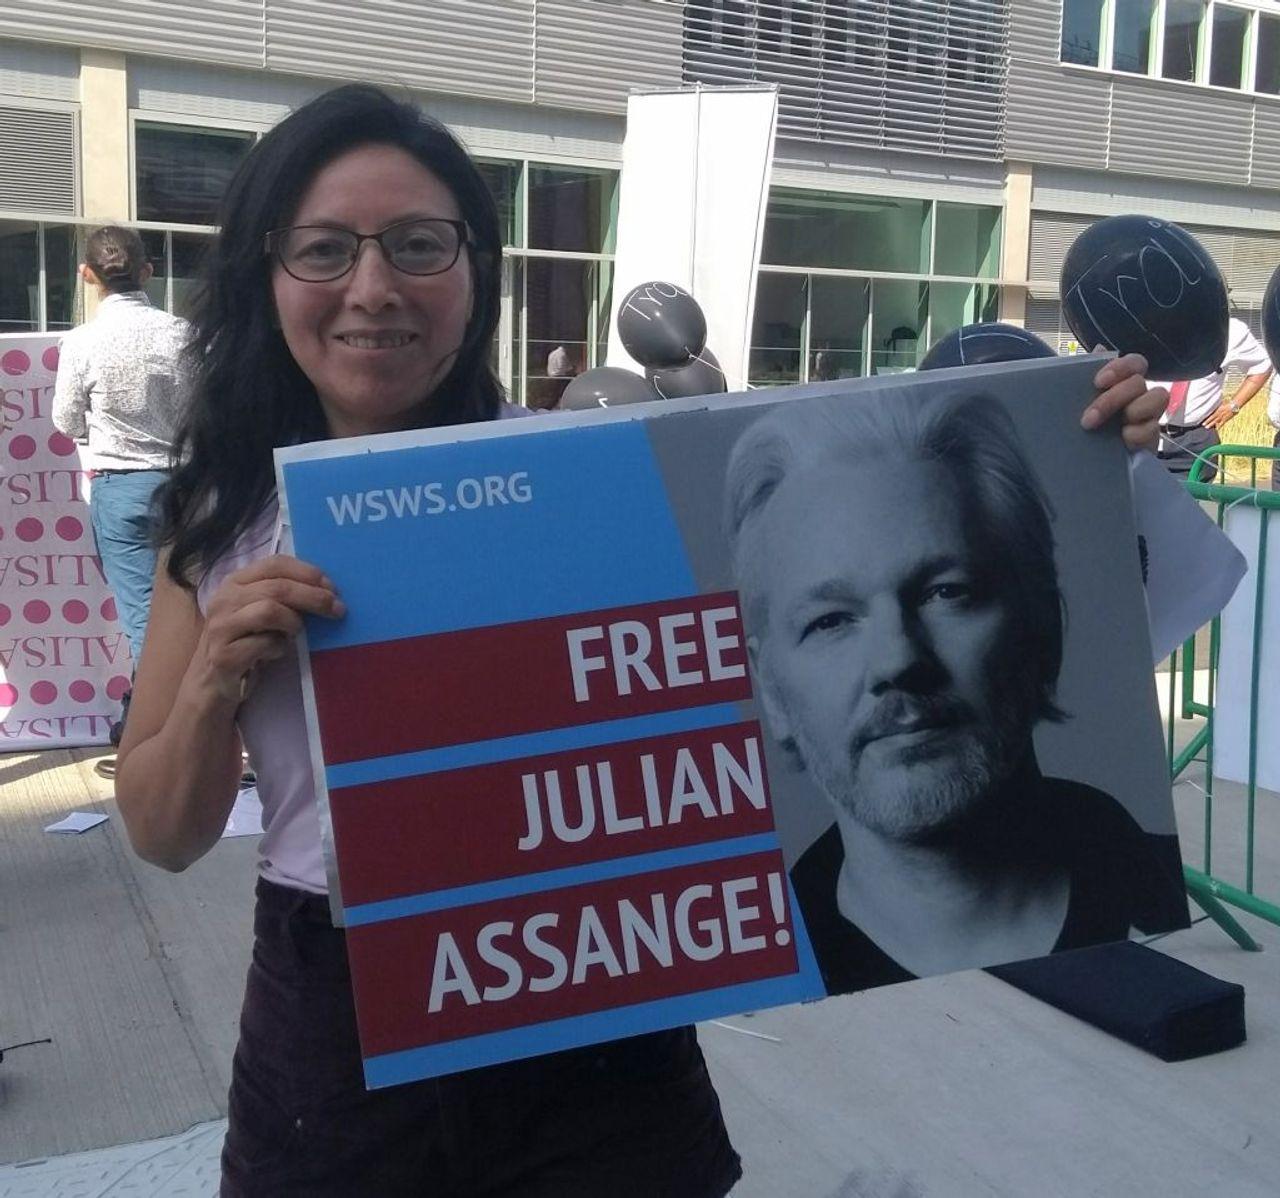 Ecuador's president seeks Assange exit from London embassy